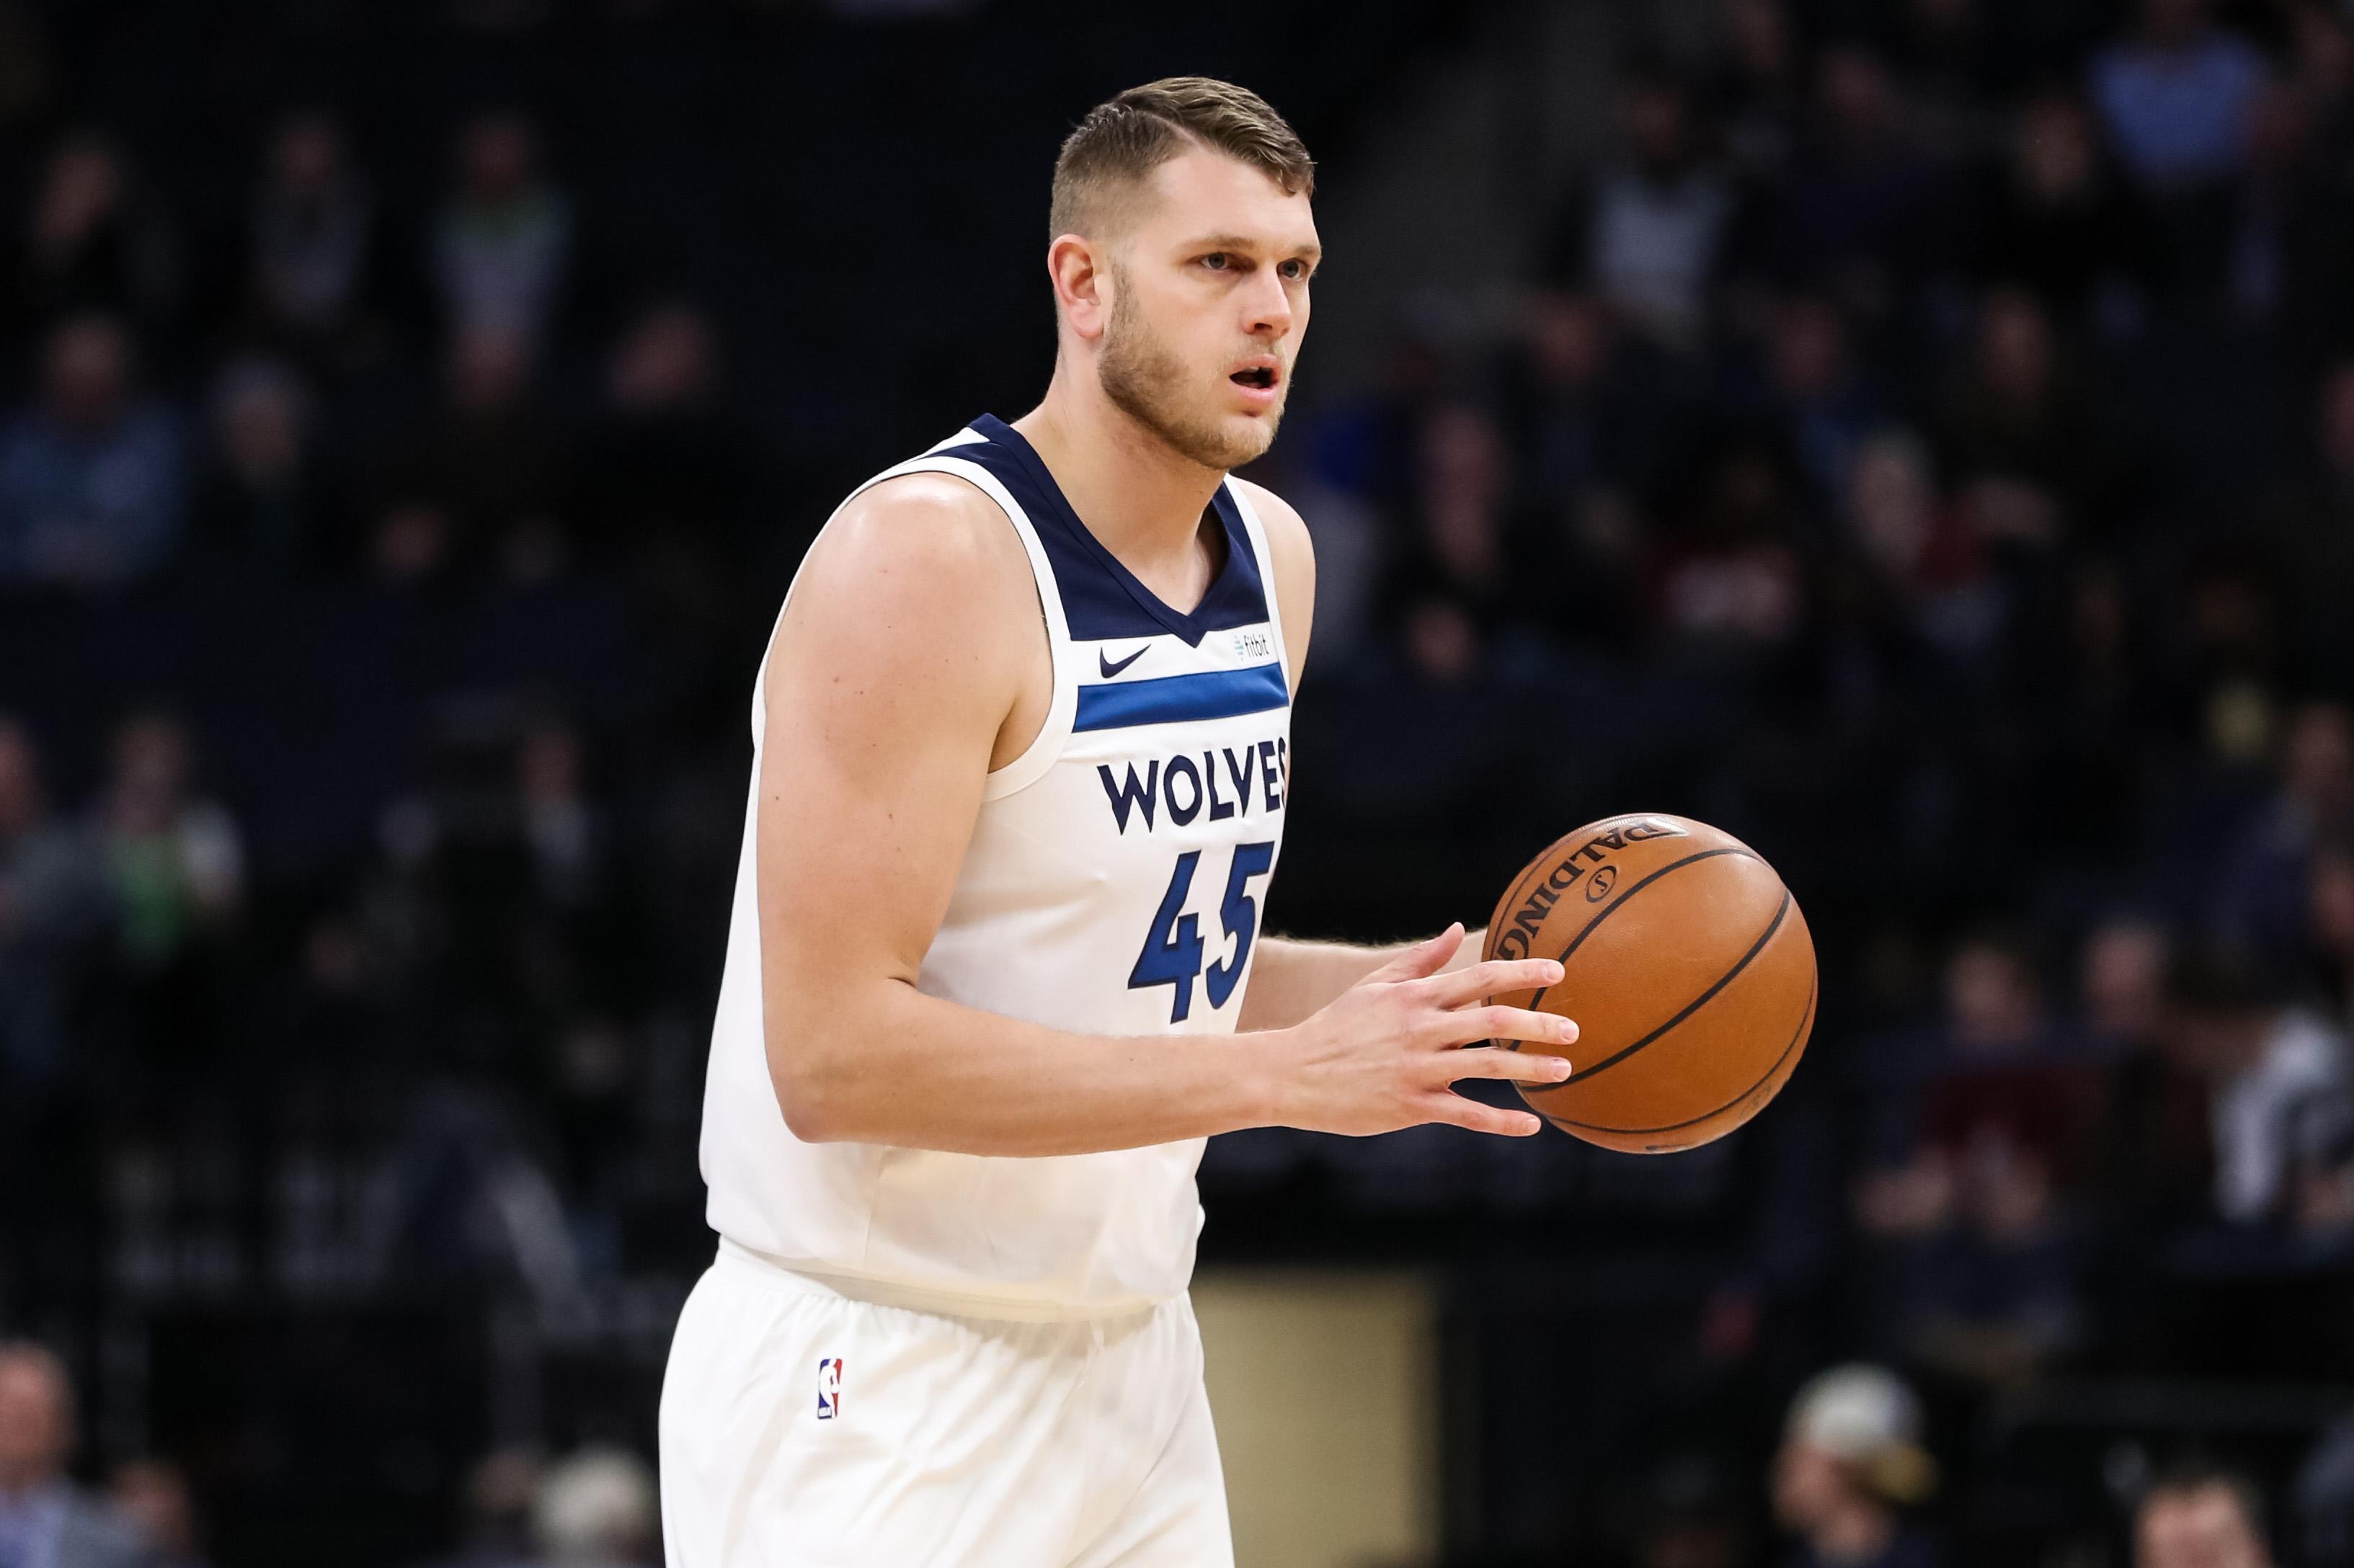 Cole Aldrich, Minnesota Timberwolves